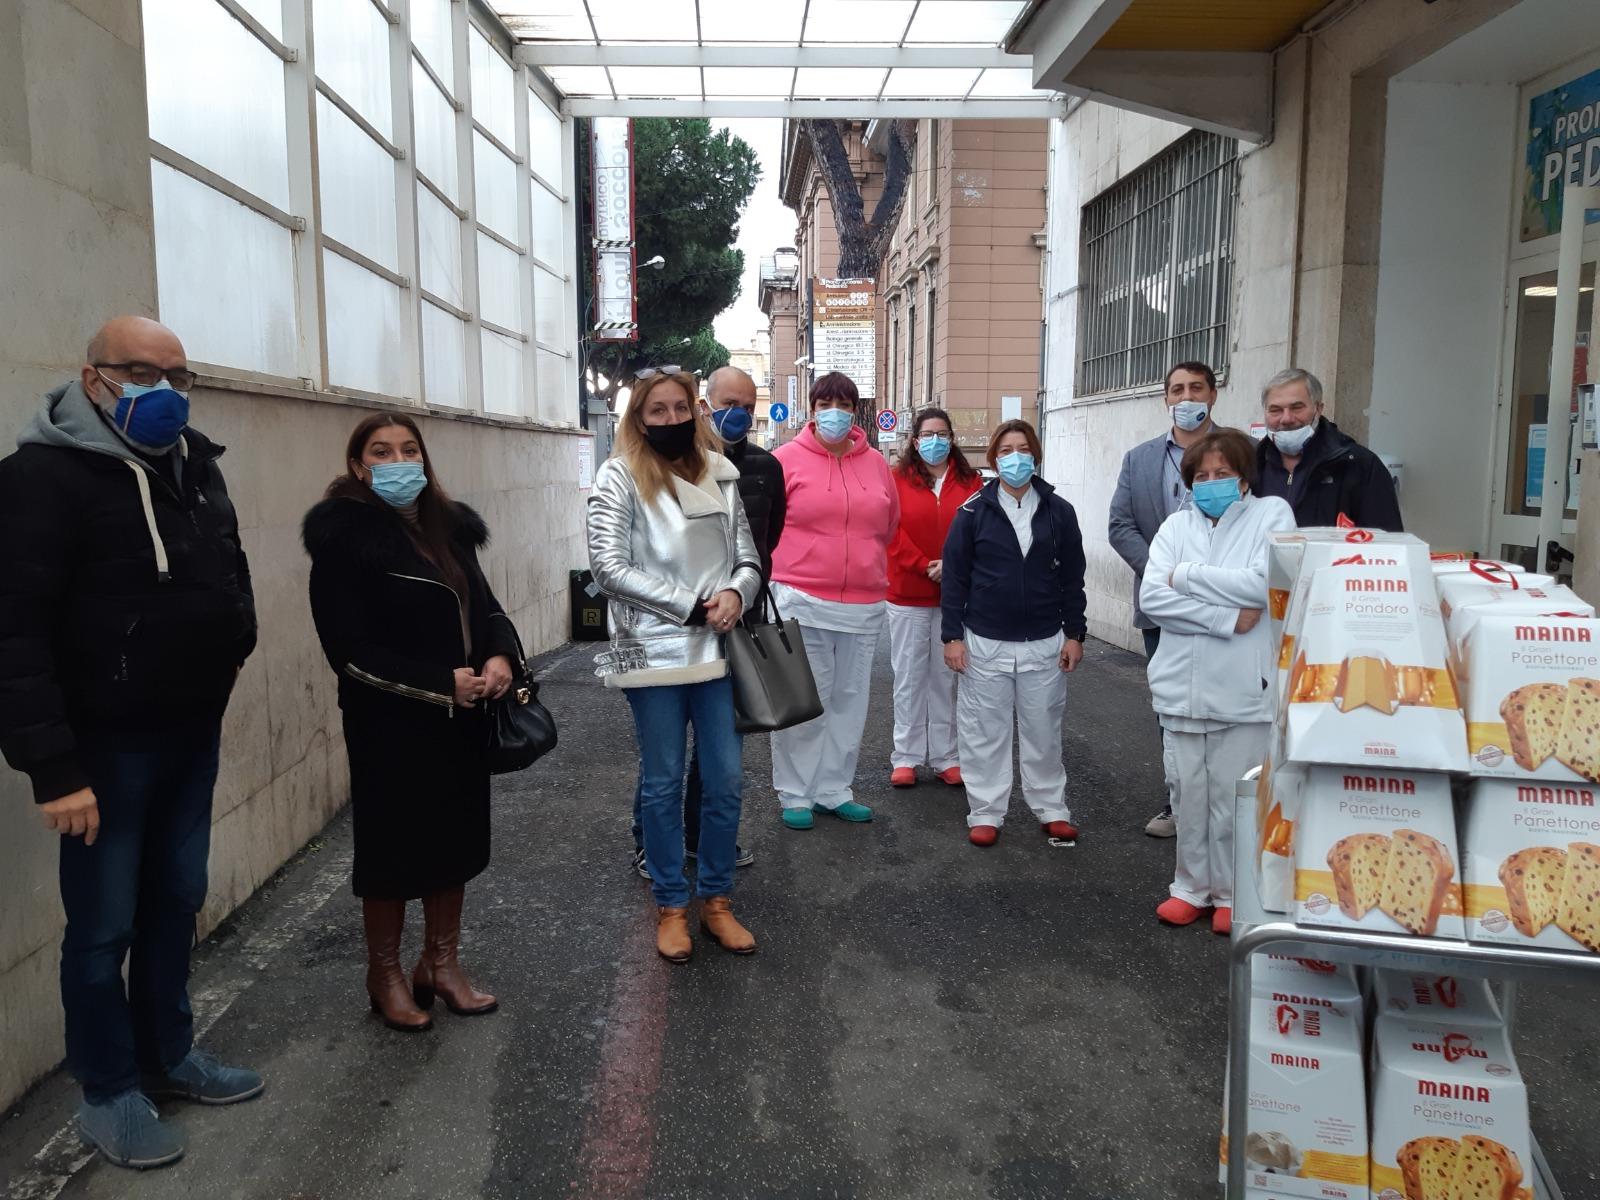 ospedale pediatrico umberto I roma